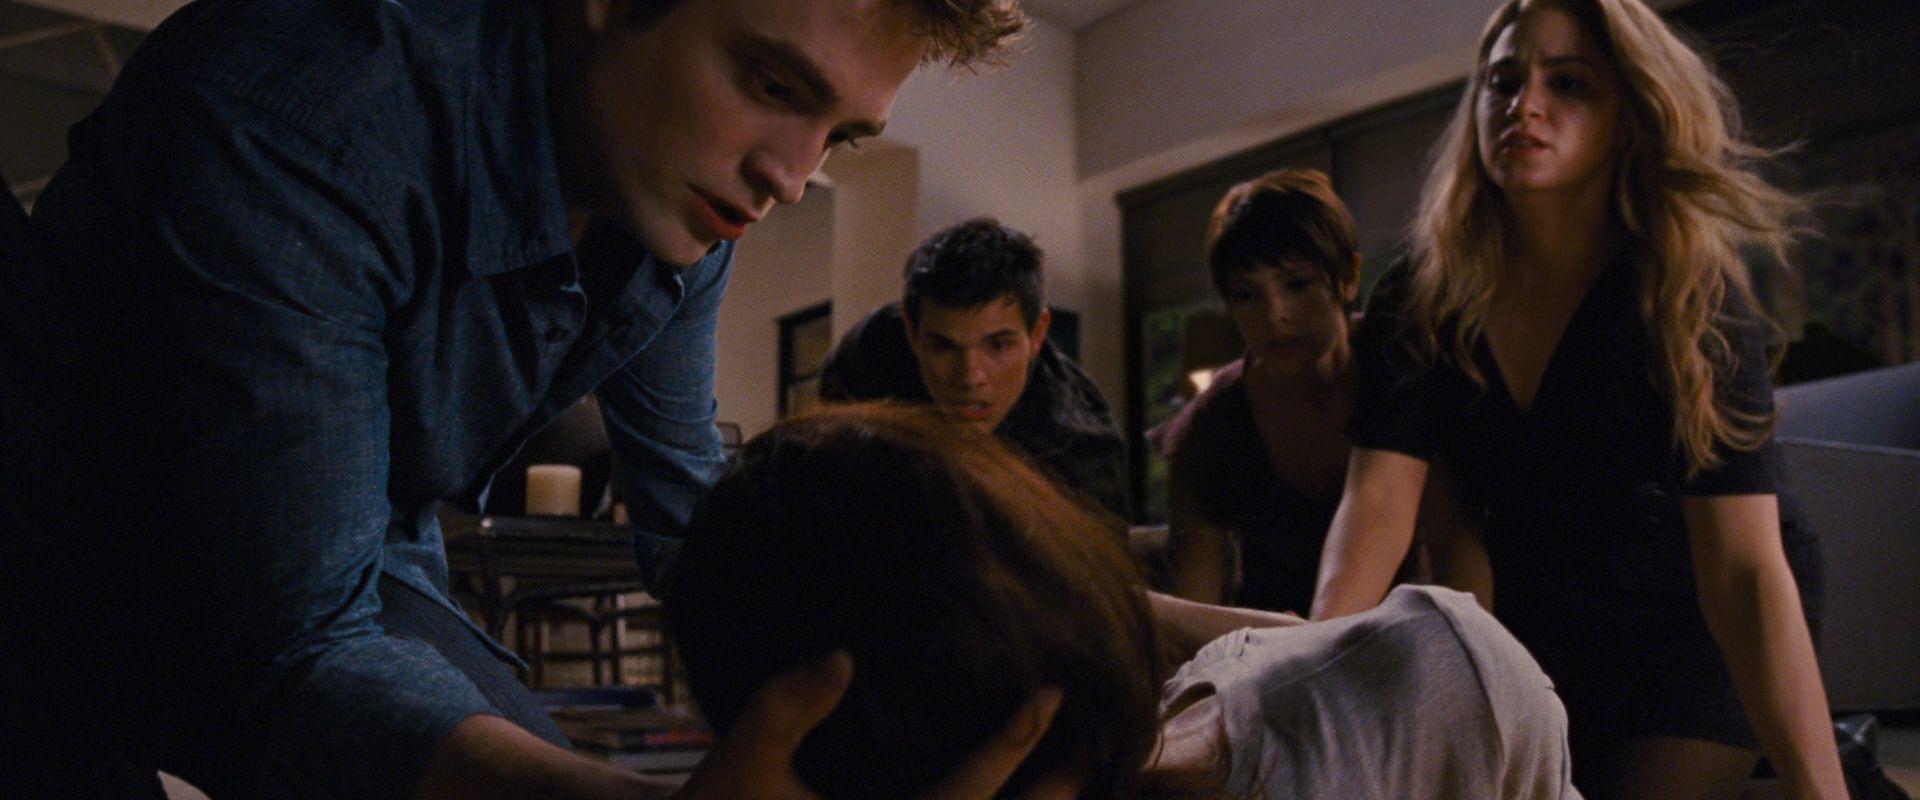 The Twilight Saga Breaking Dawn - Part 1 - IMDb